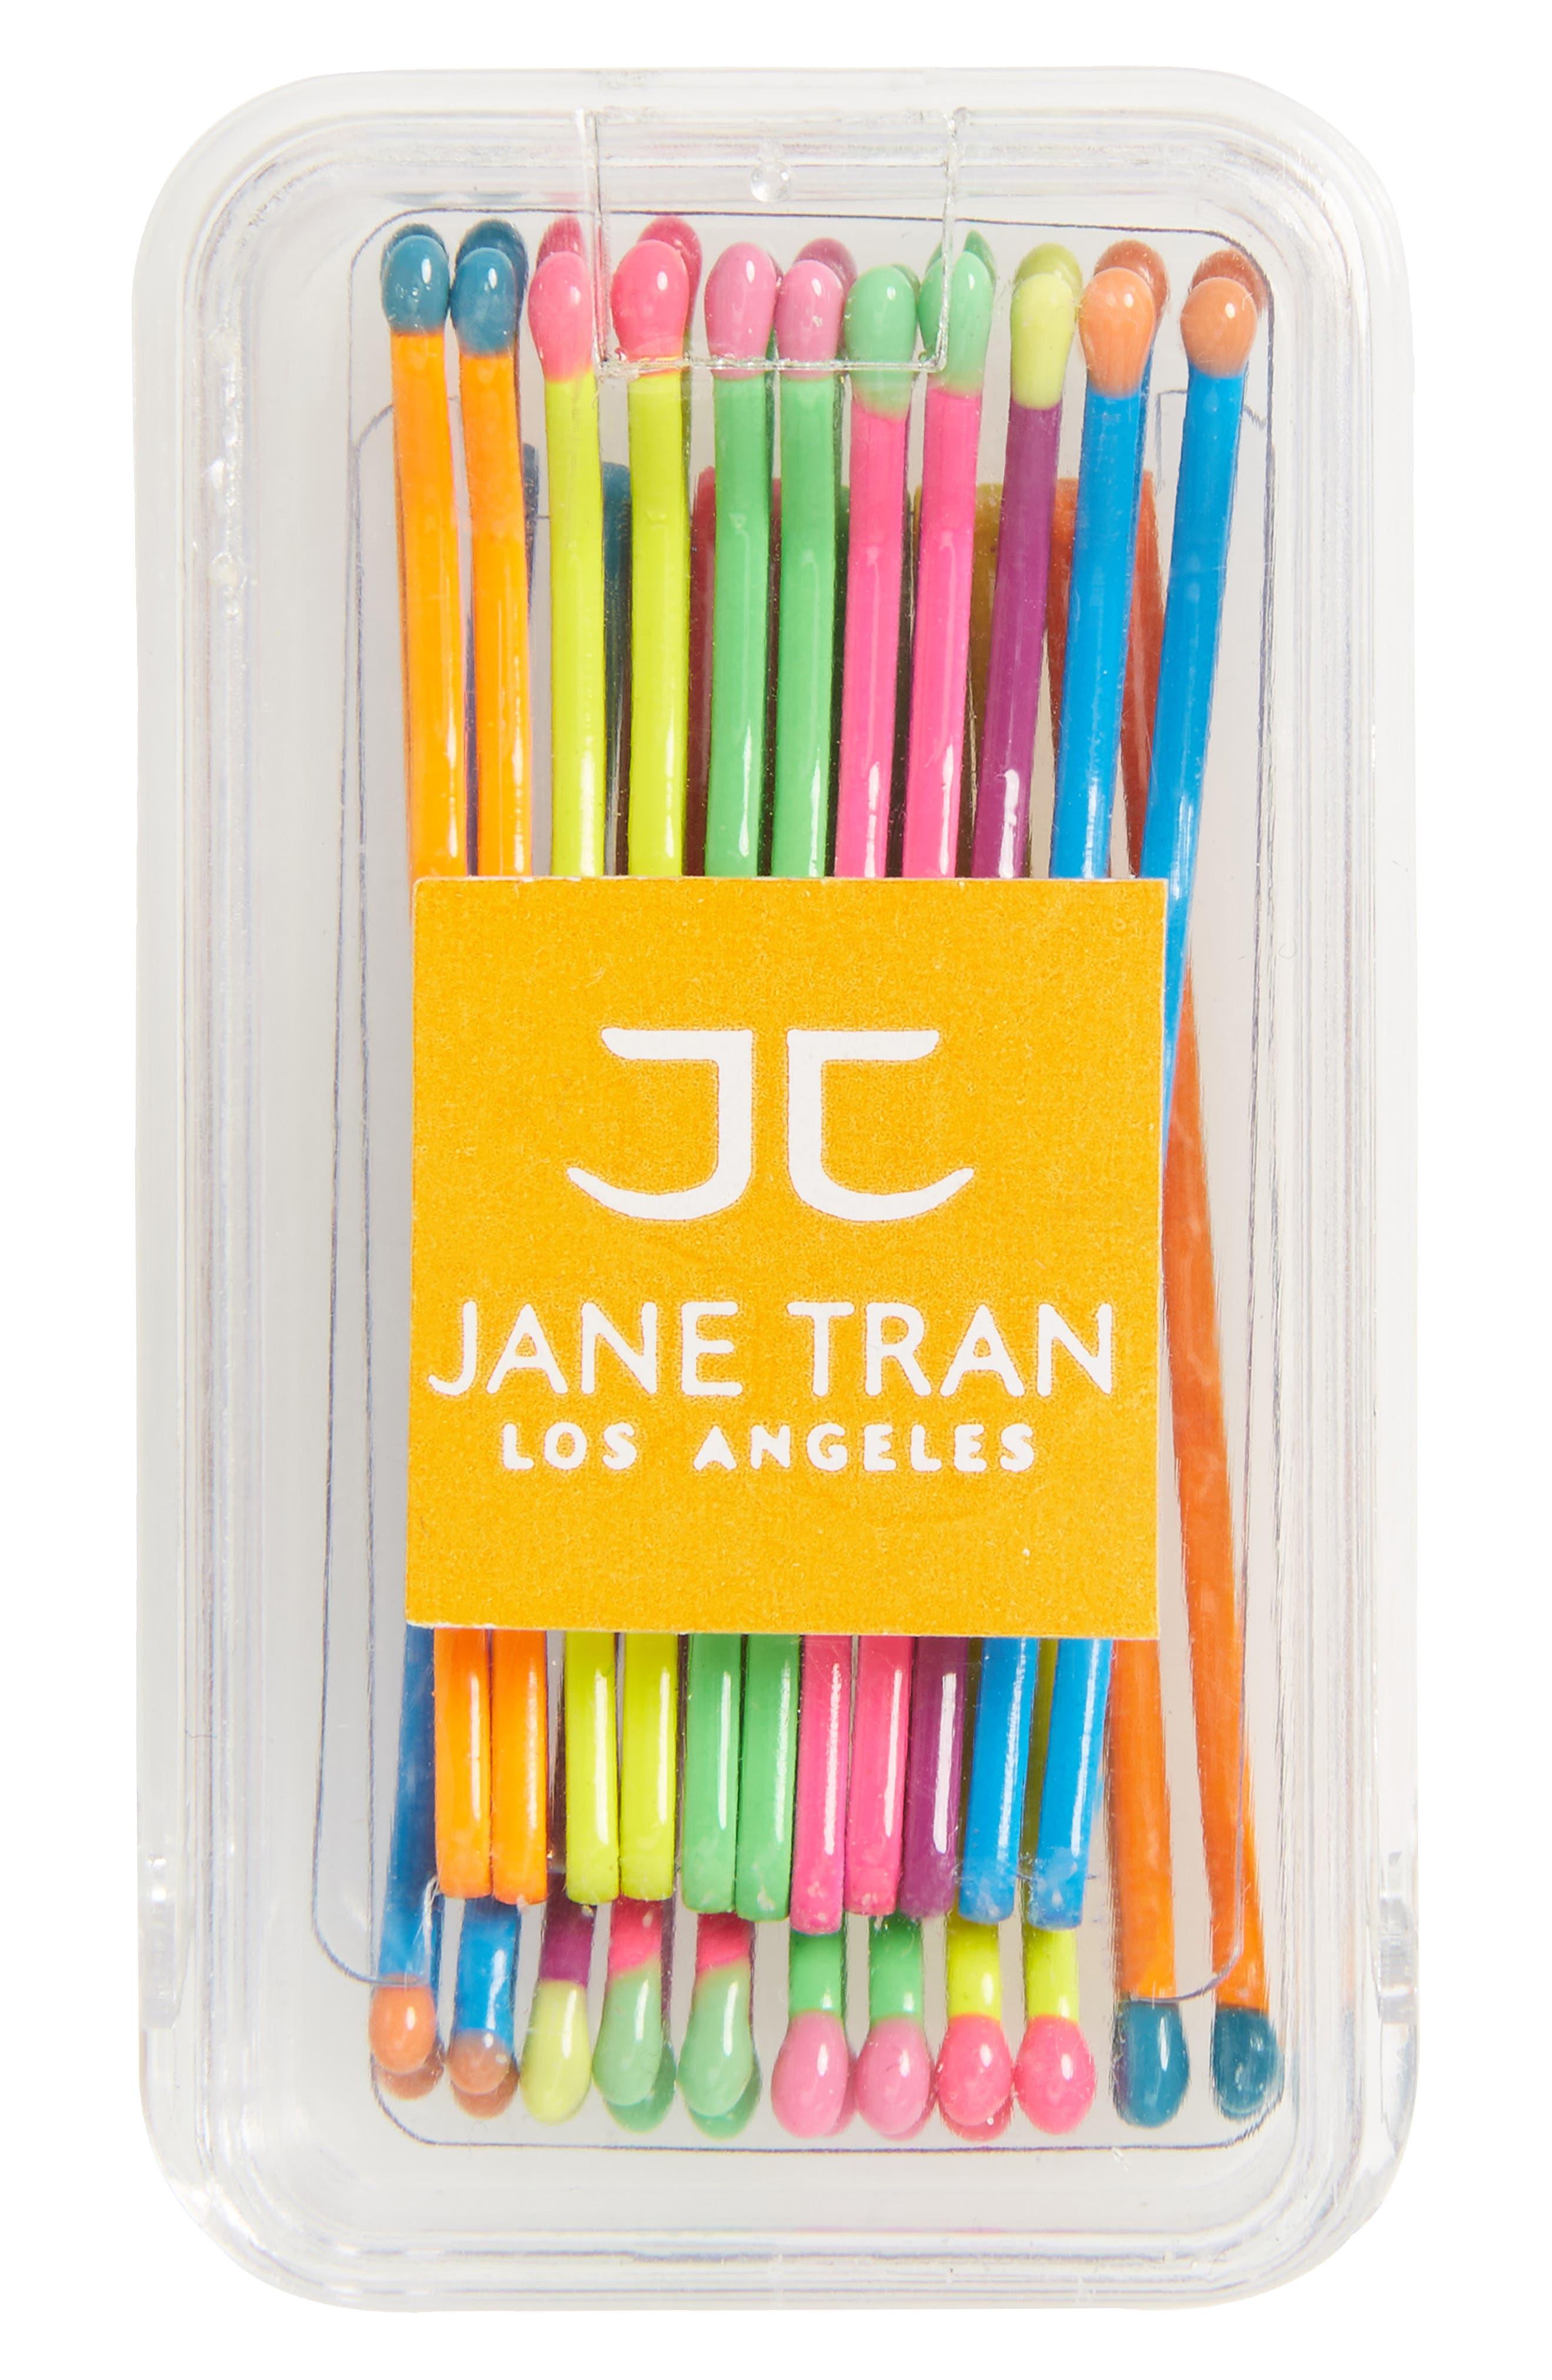 Alternate Image 1 Selected - Jane Tran Neon Rainbow Matchsticks Set of 20 Assorted Bobby Pins